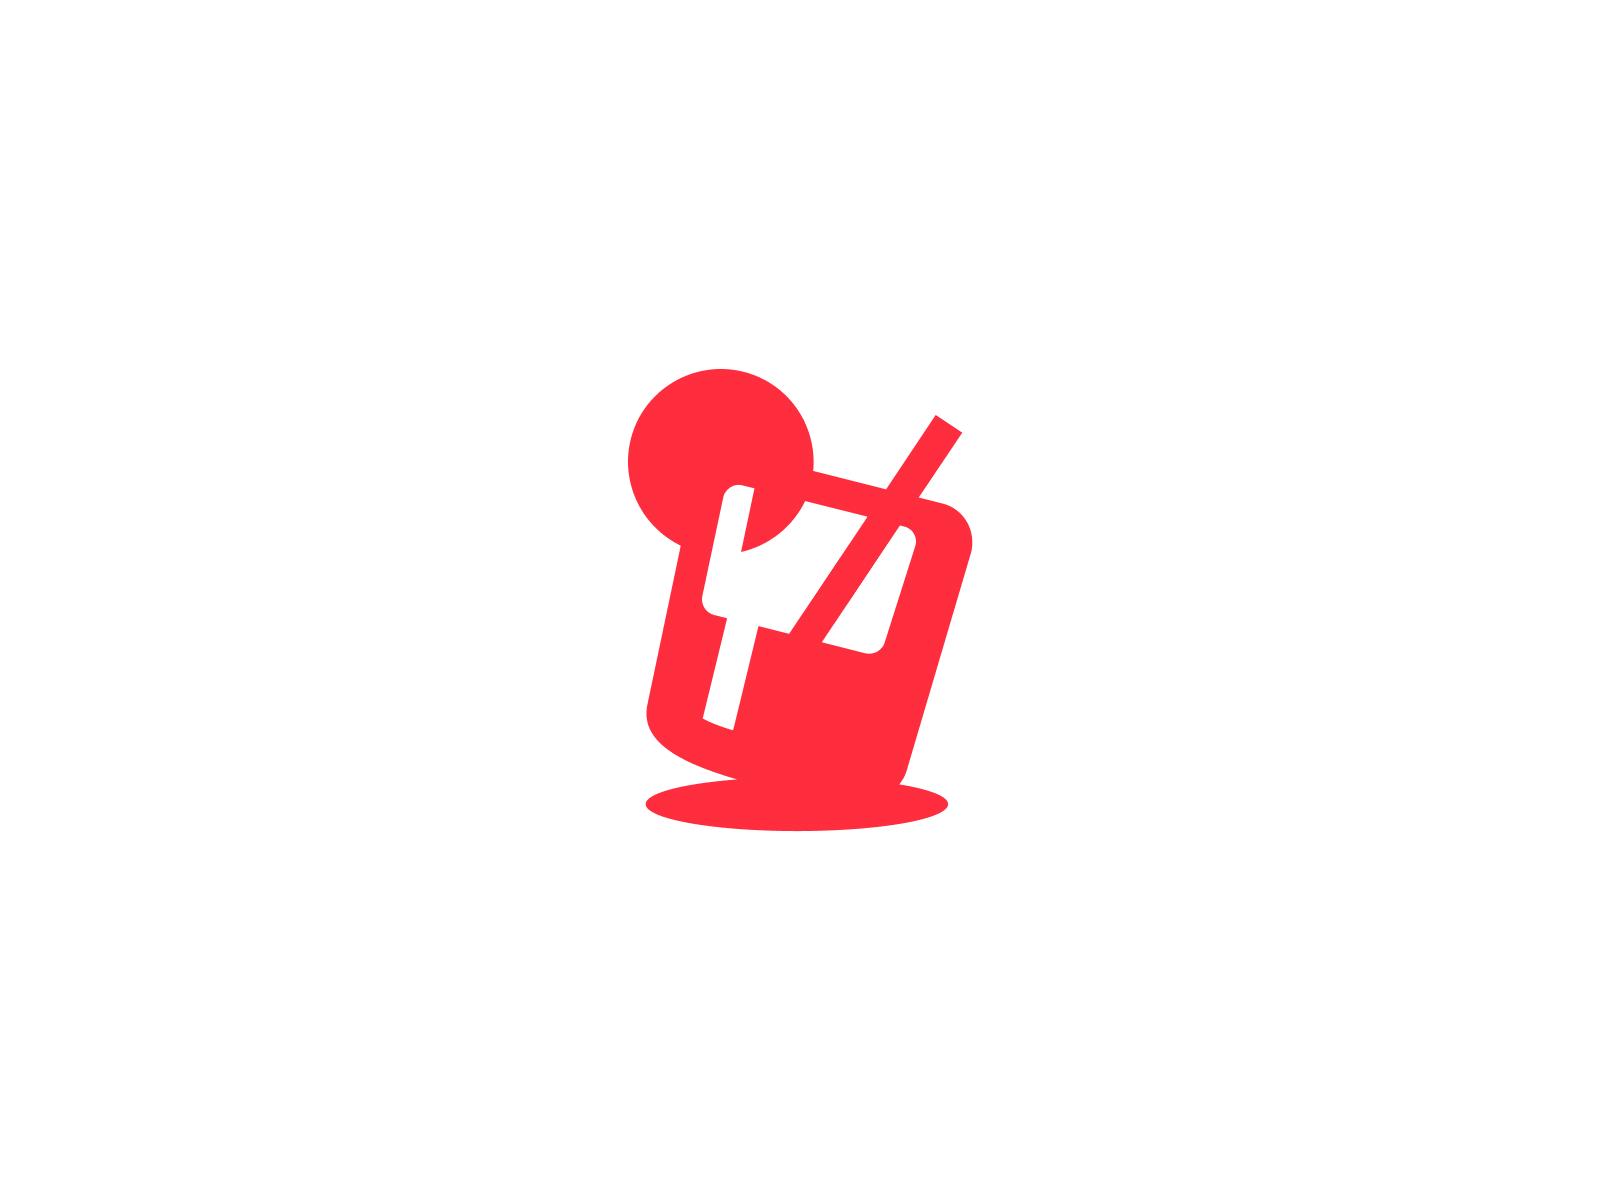 Tab hop logo